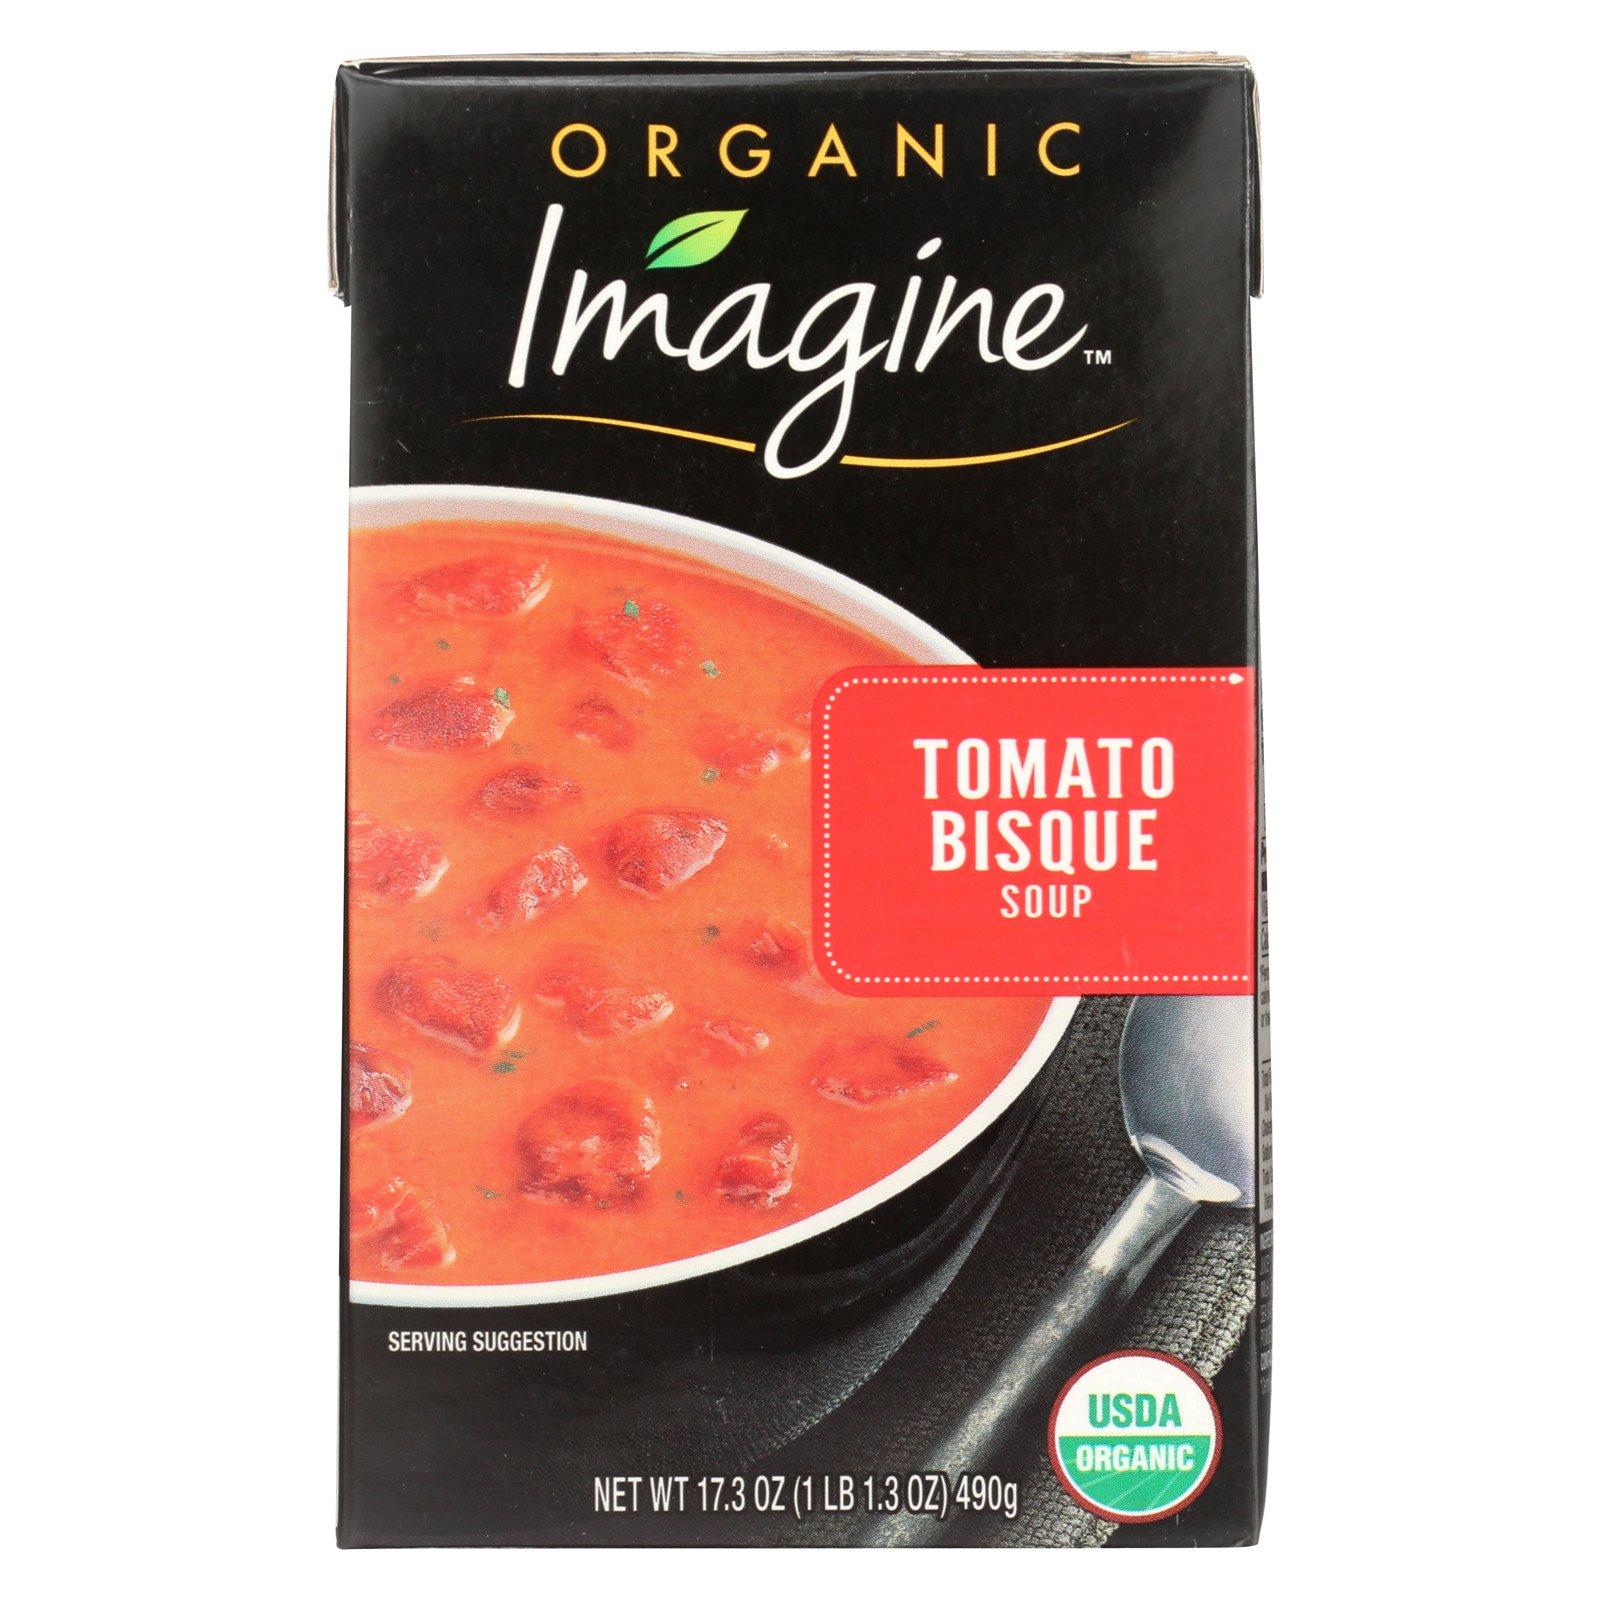 Imagine Foods Tomato Bisque Soup - Organic - Case of 12 - 17.3 oz.